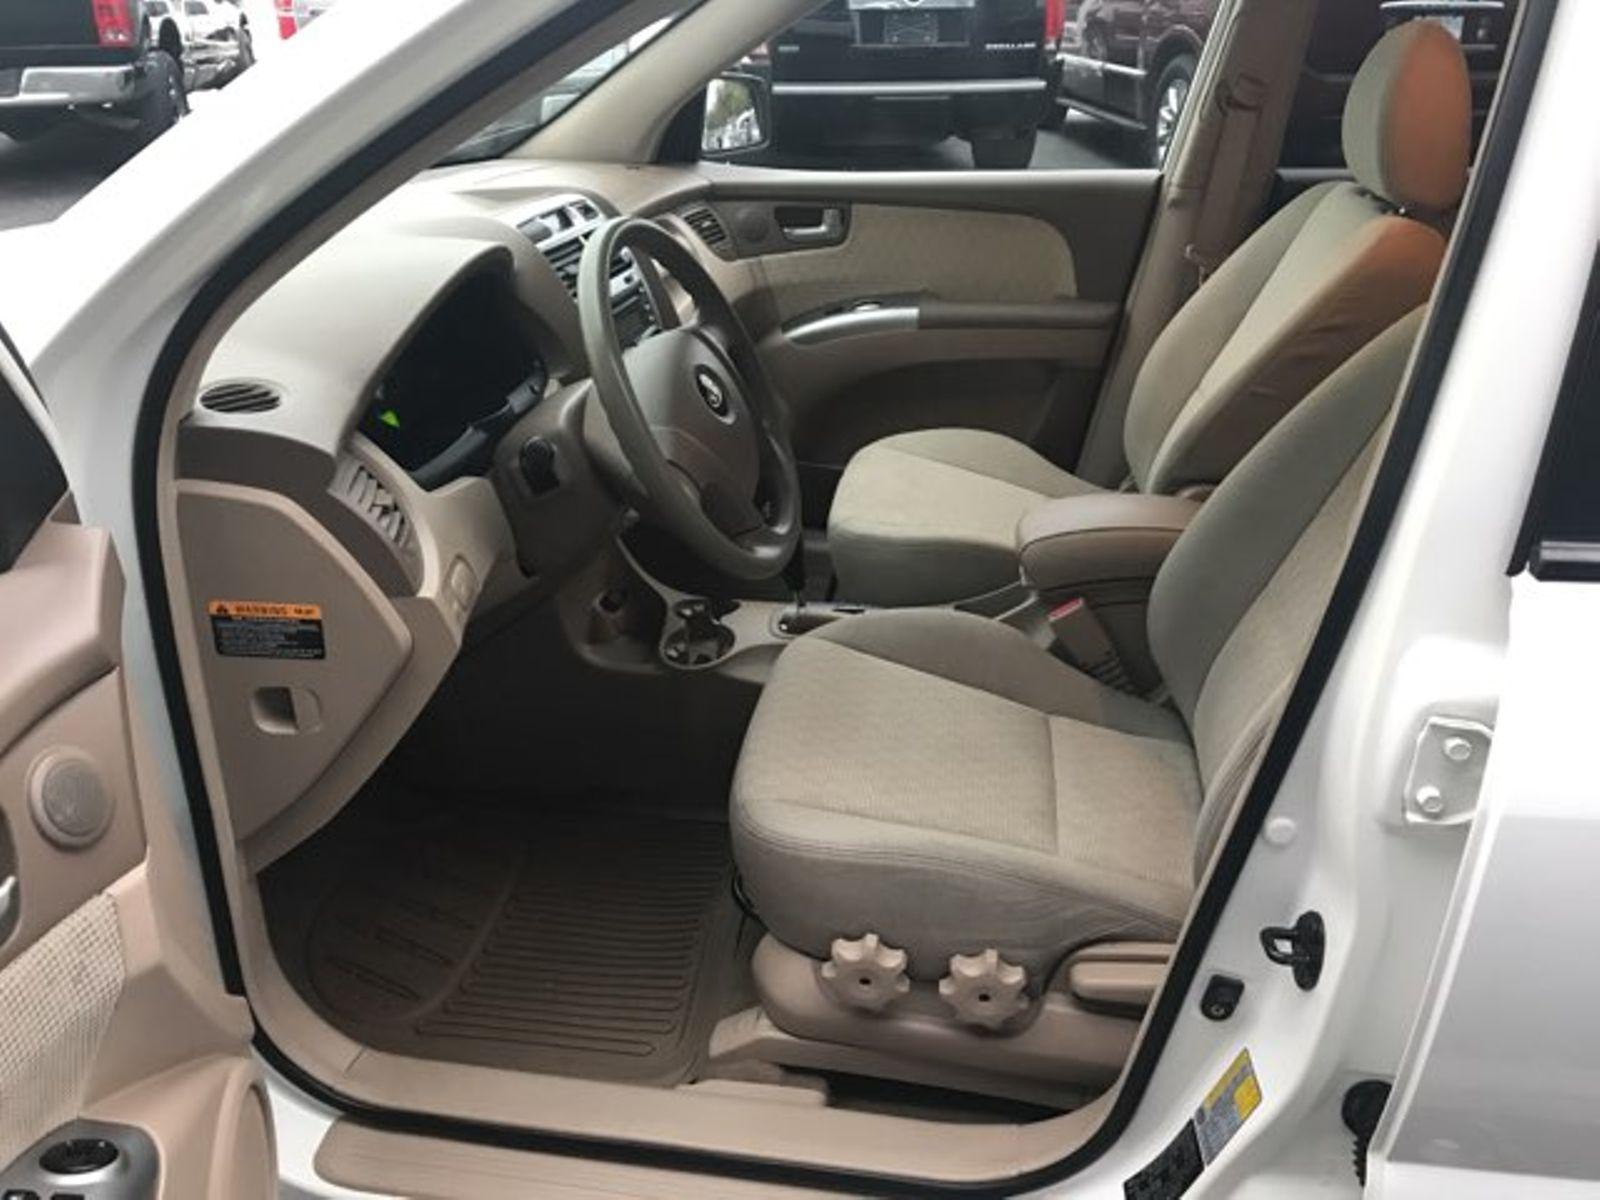 2006 Kia Sportage LX city TX Clear Choice Automotive